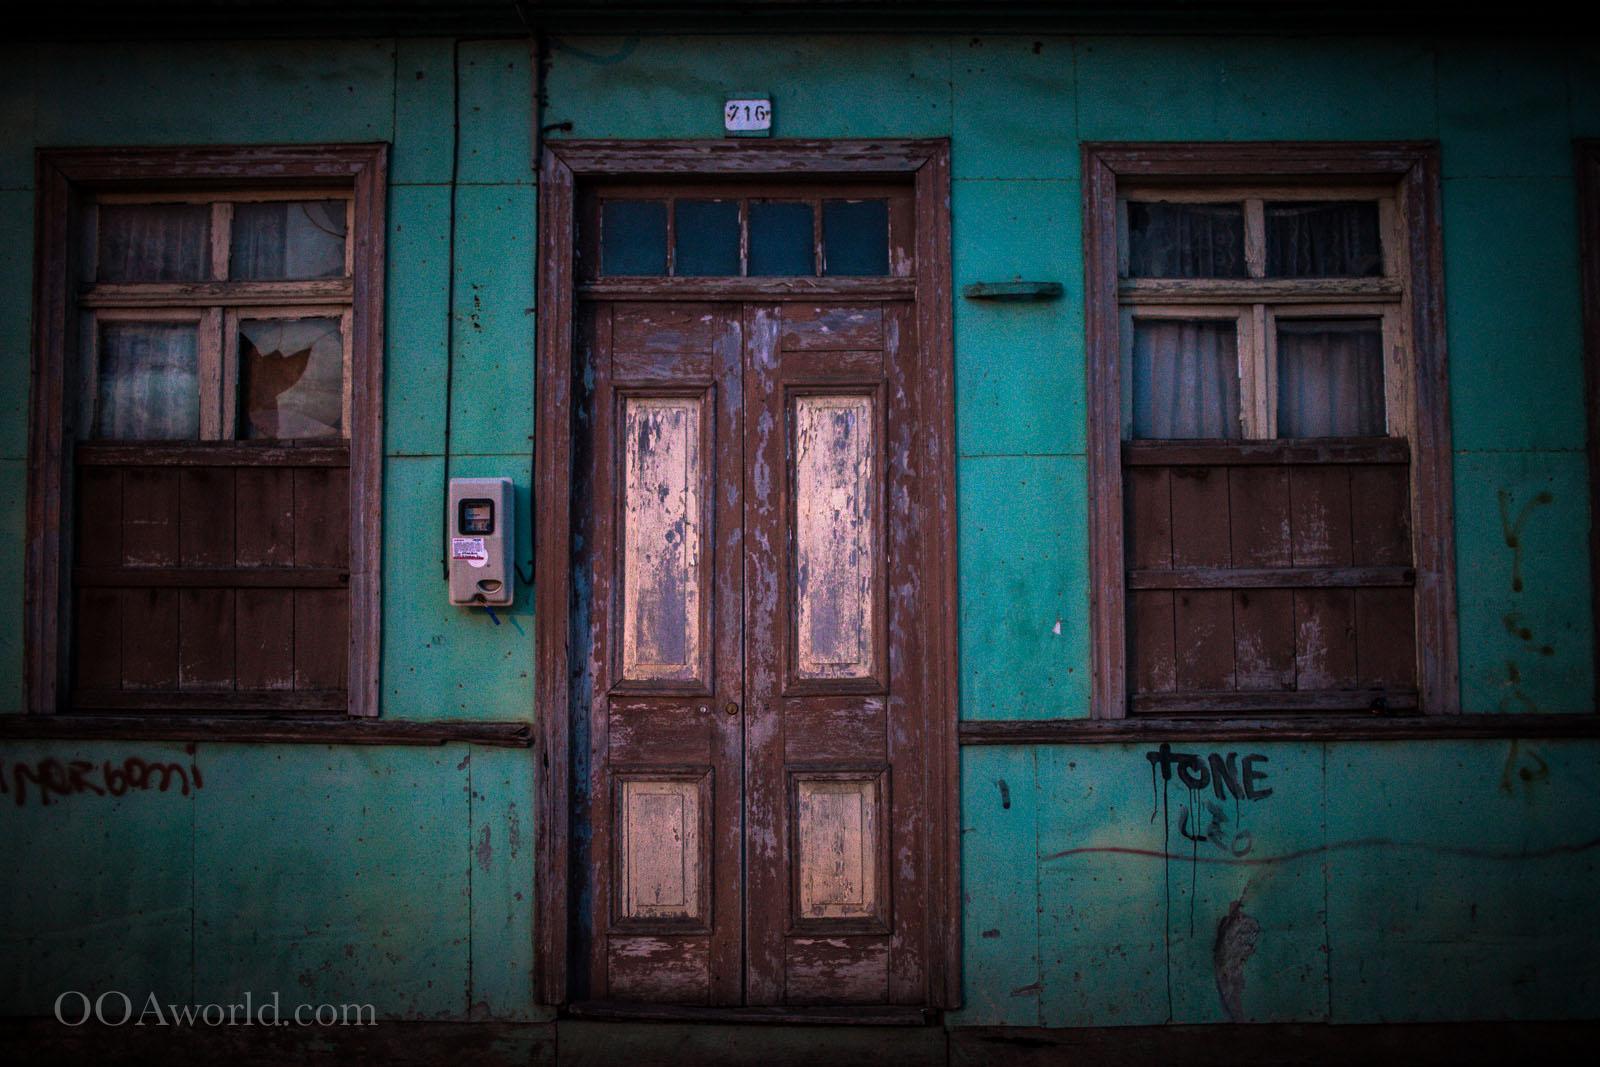 Puerto Natales Green Dreams Photo Ooaworld